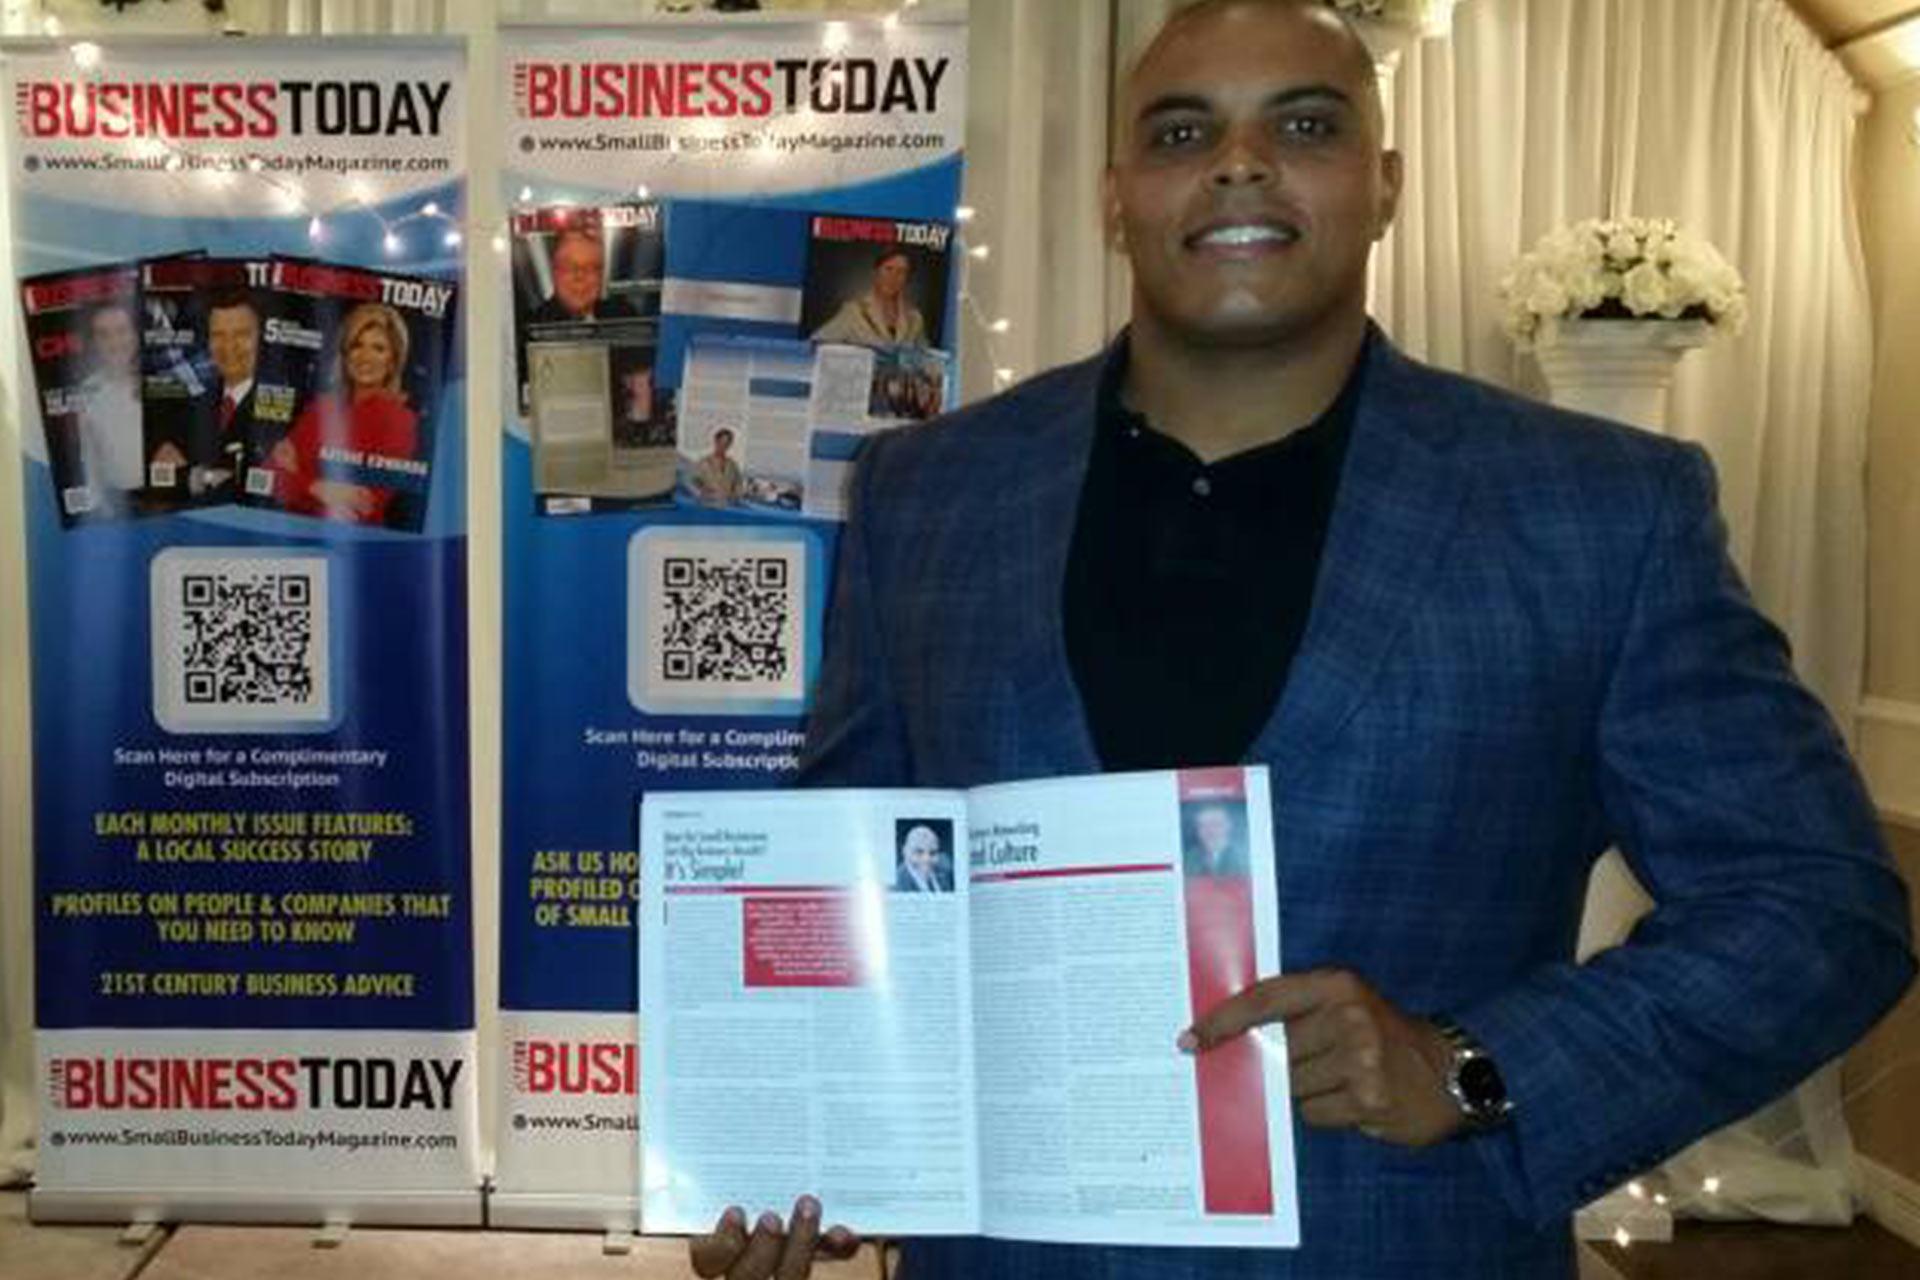 Jason Montanez Small Business Today